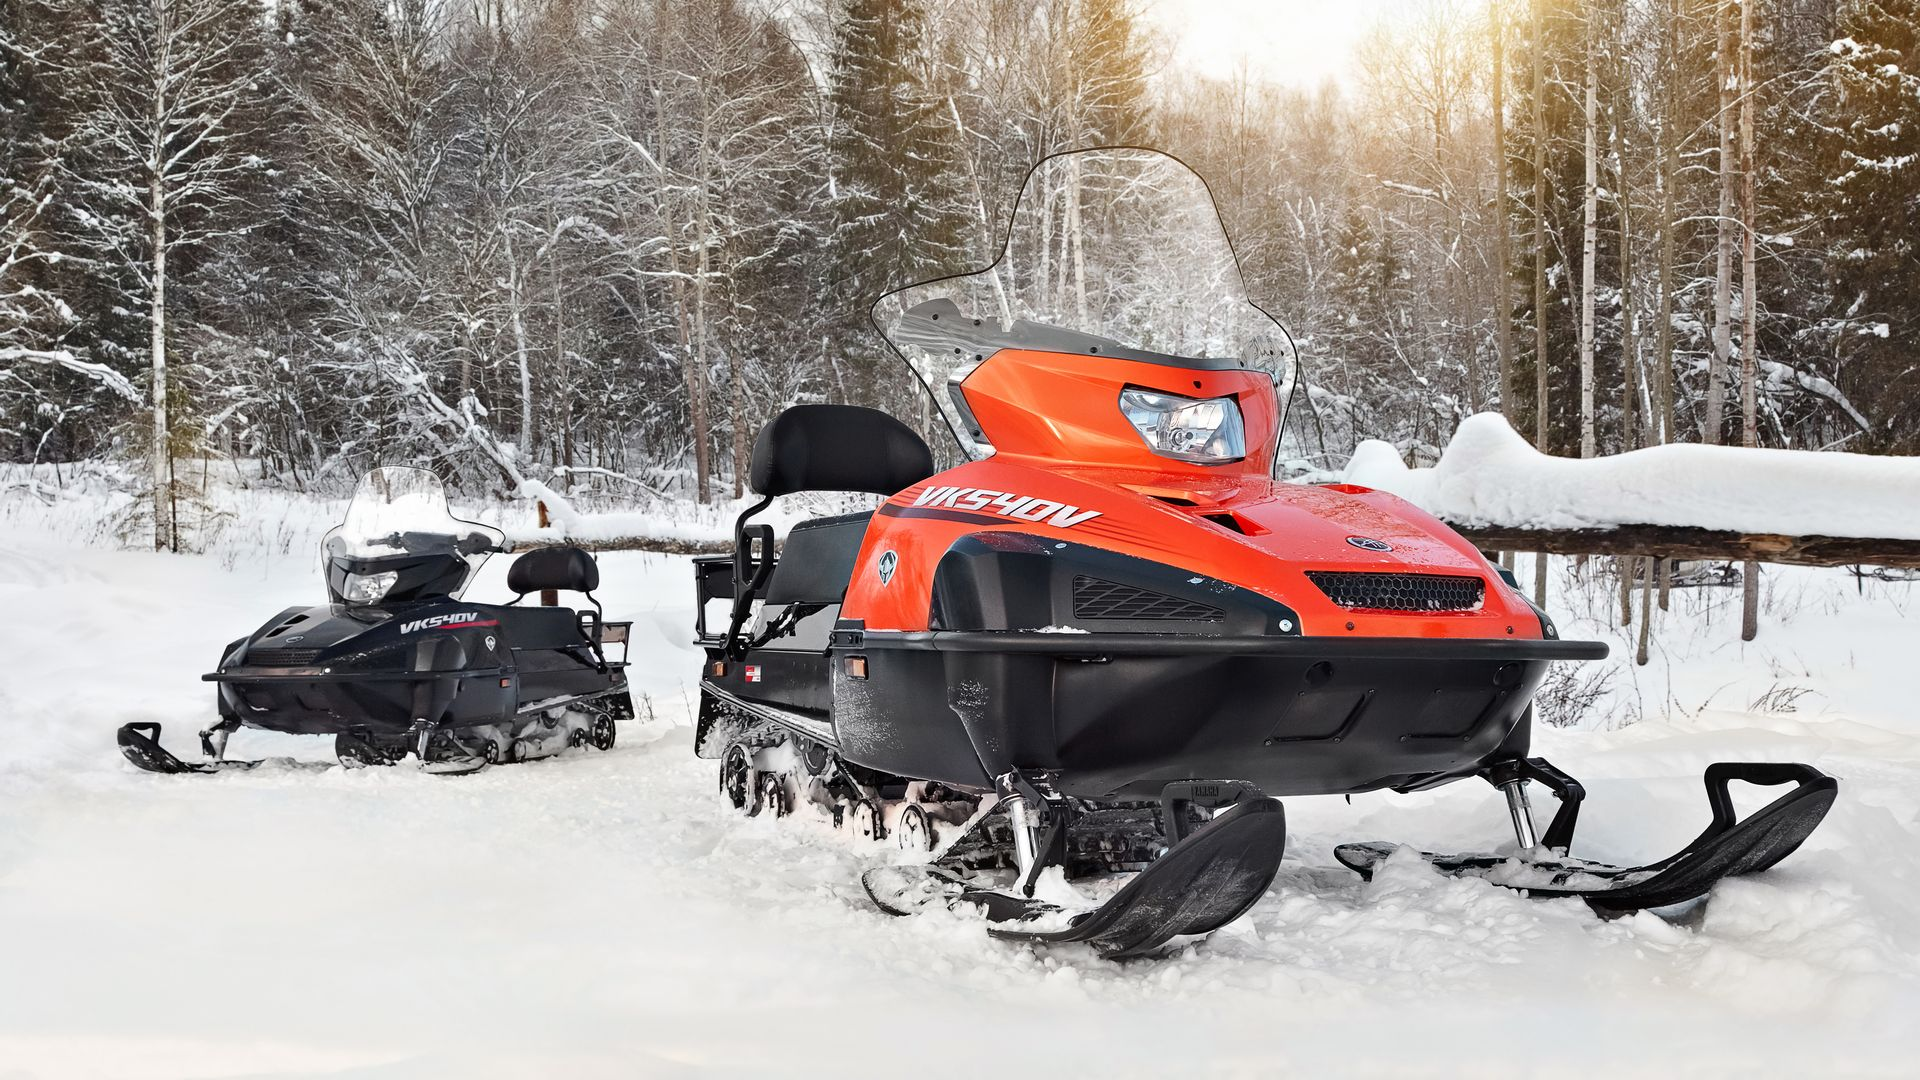 Снегоход Викинг 540